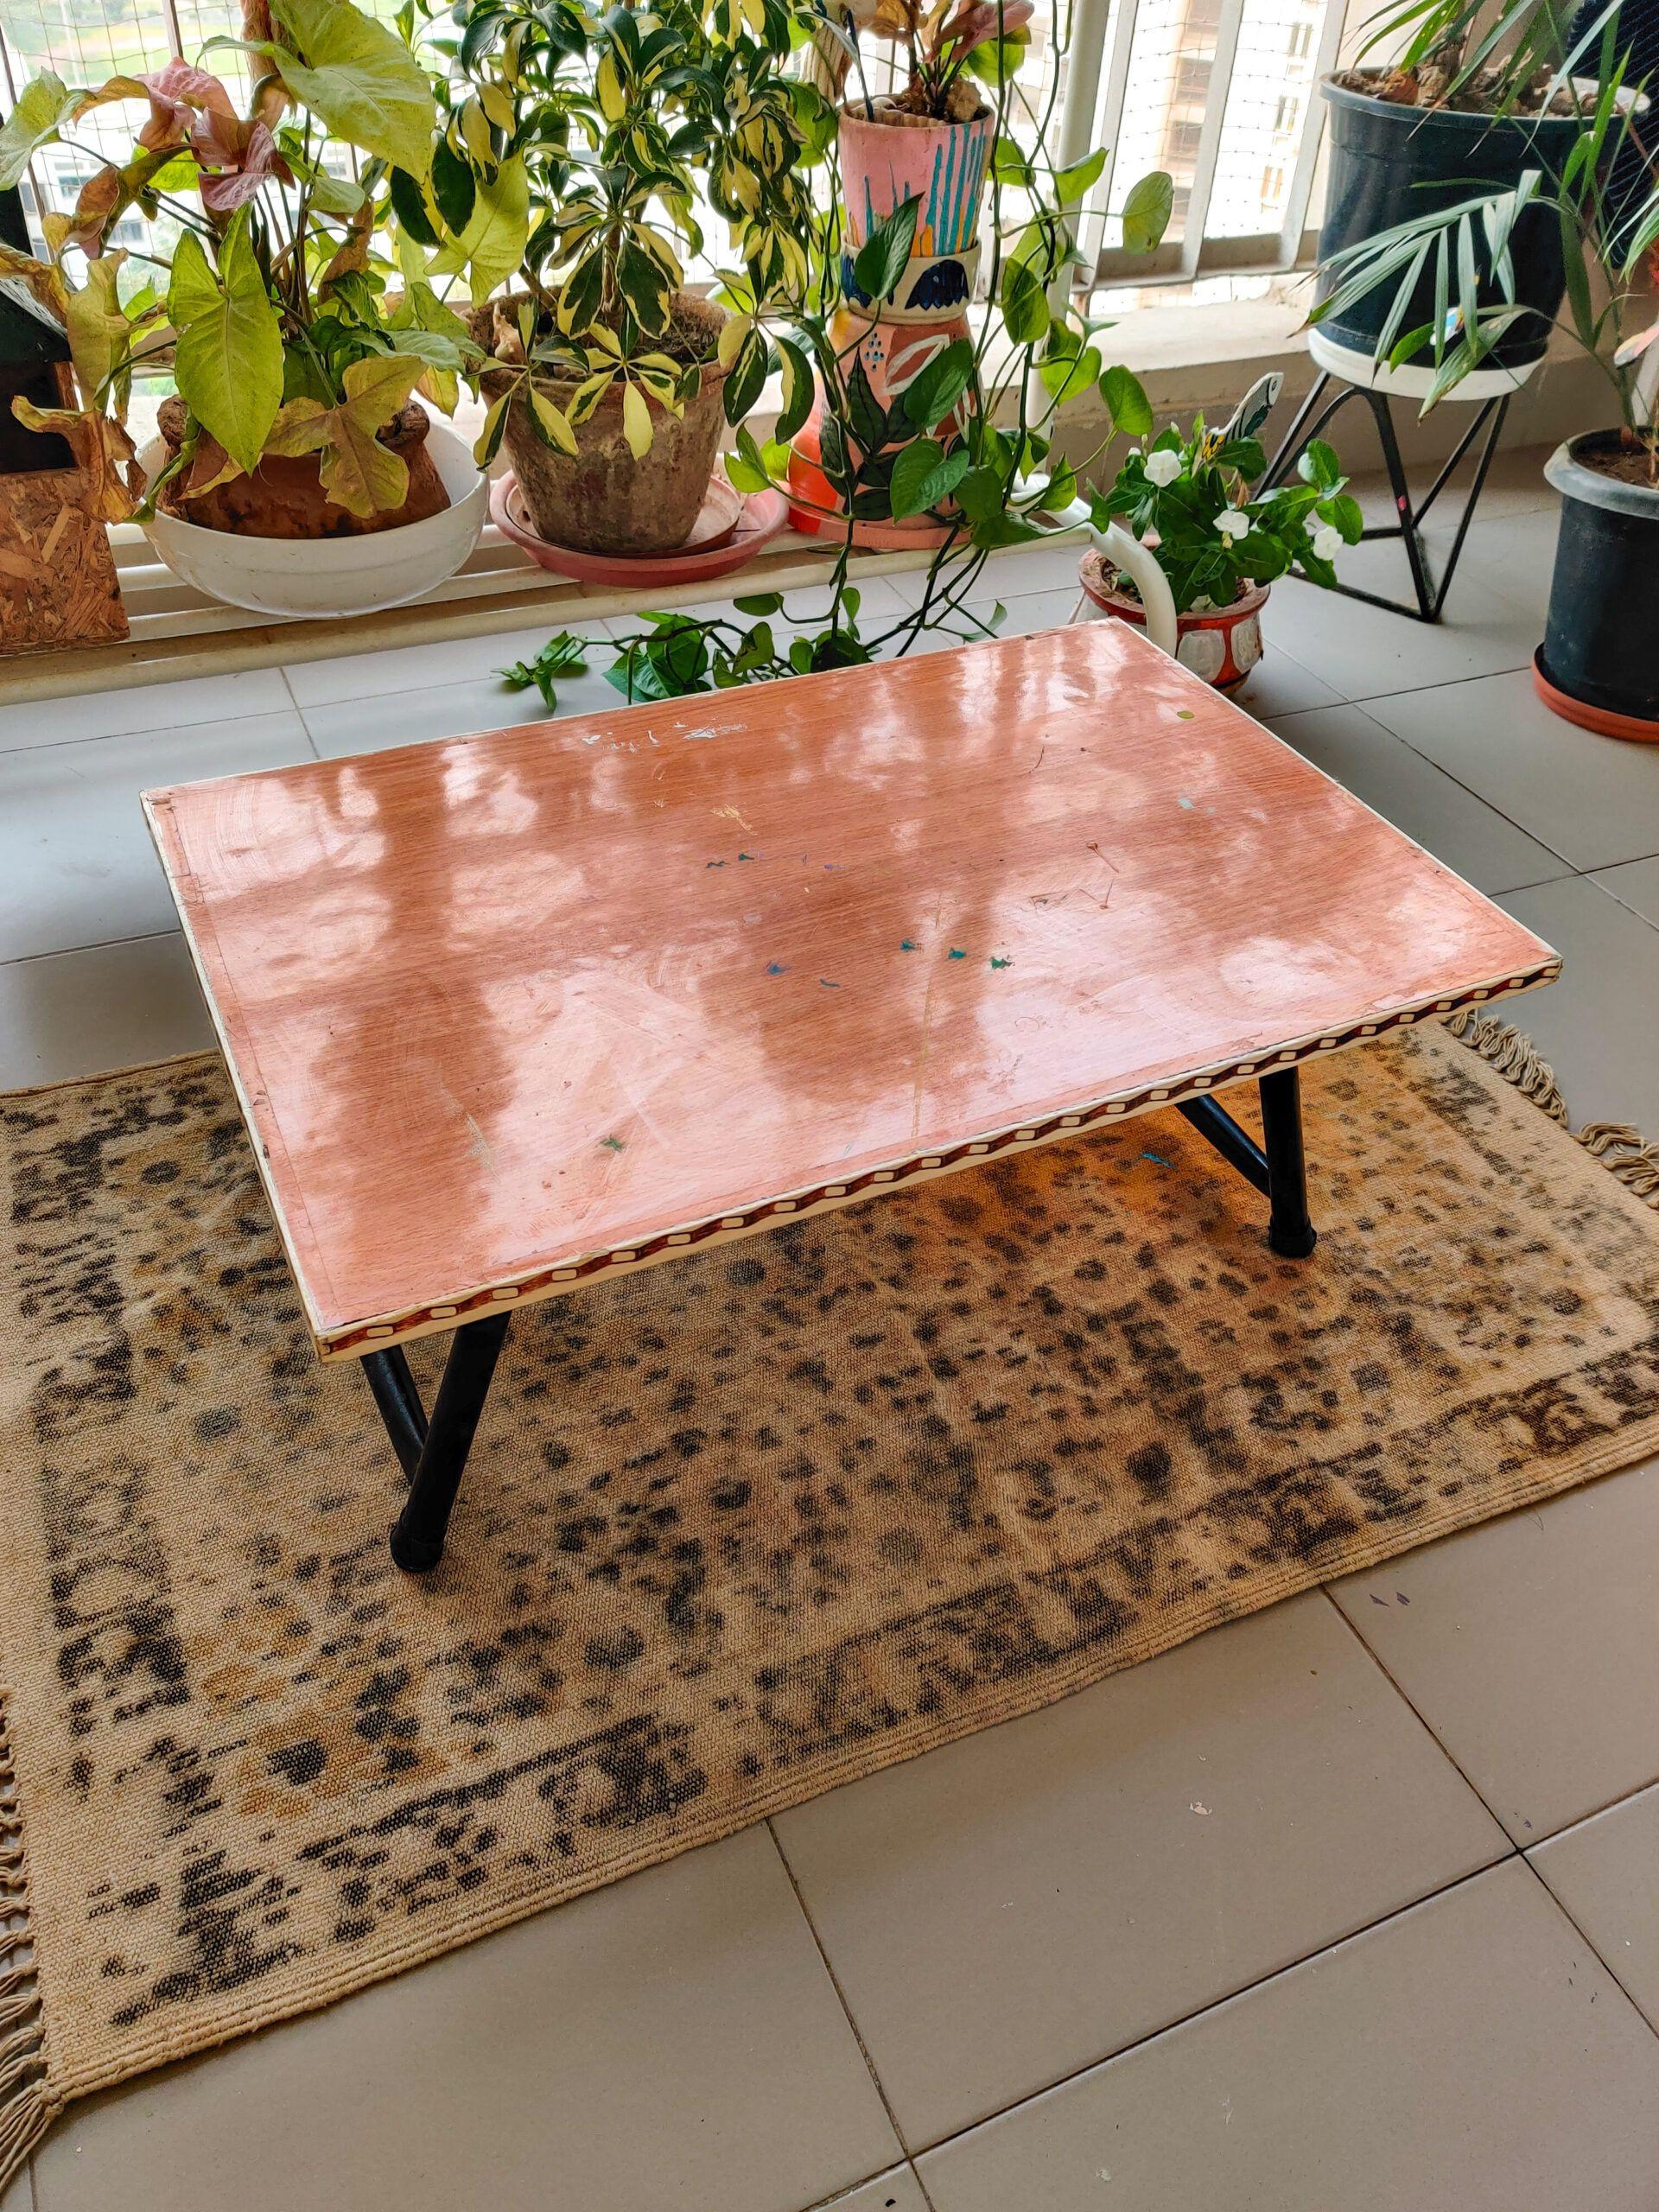 diy room decor-breakfast table-before image